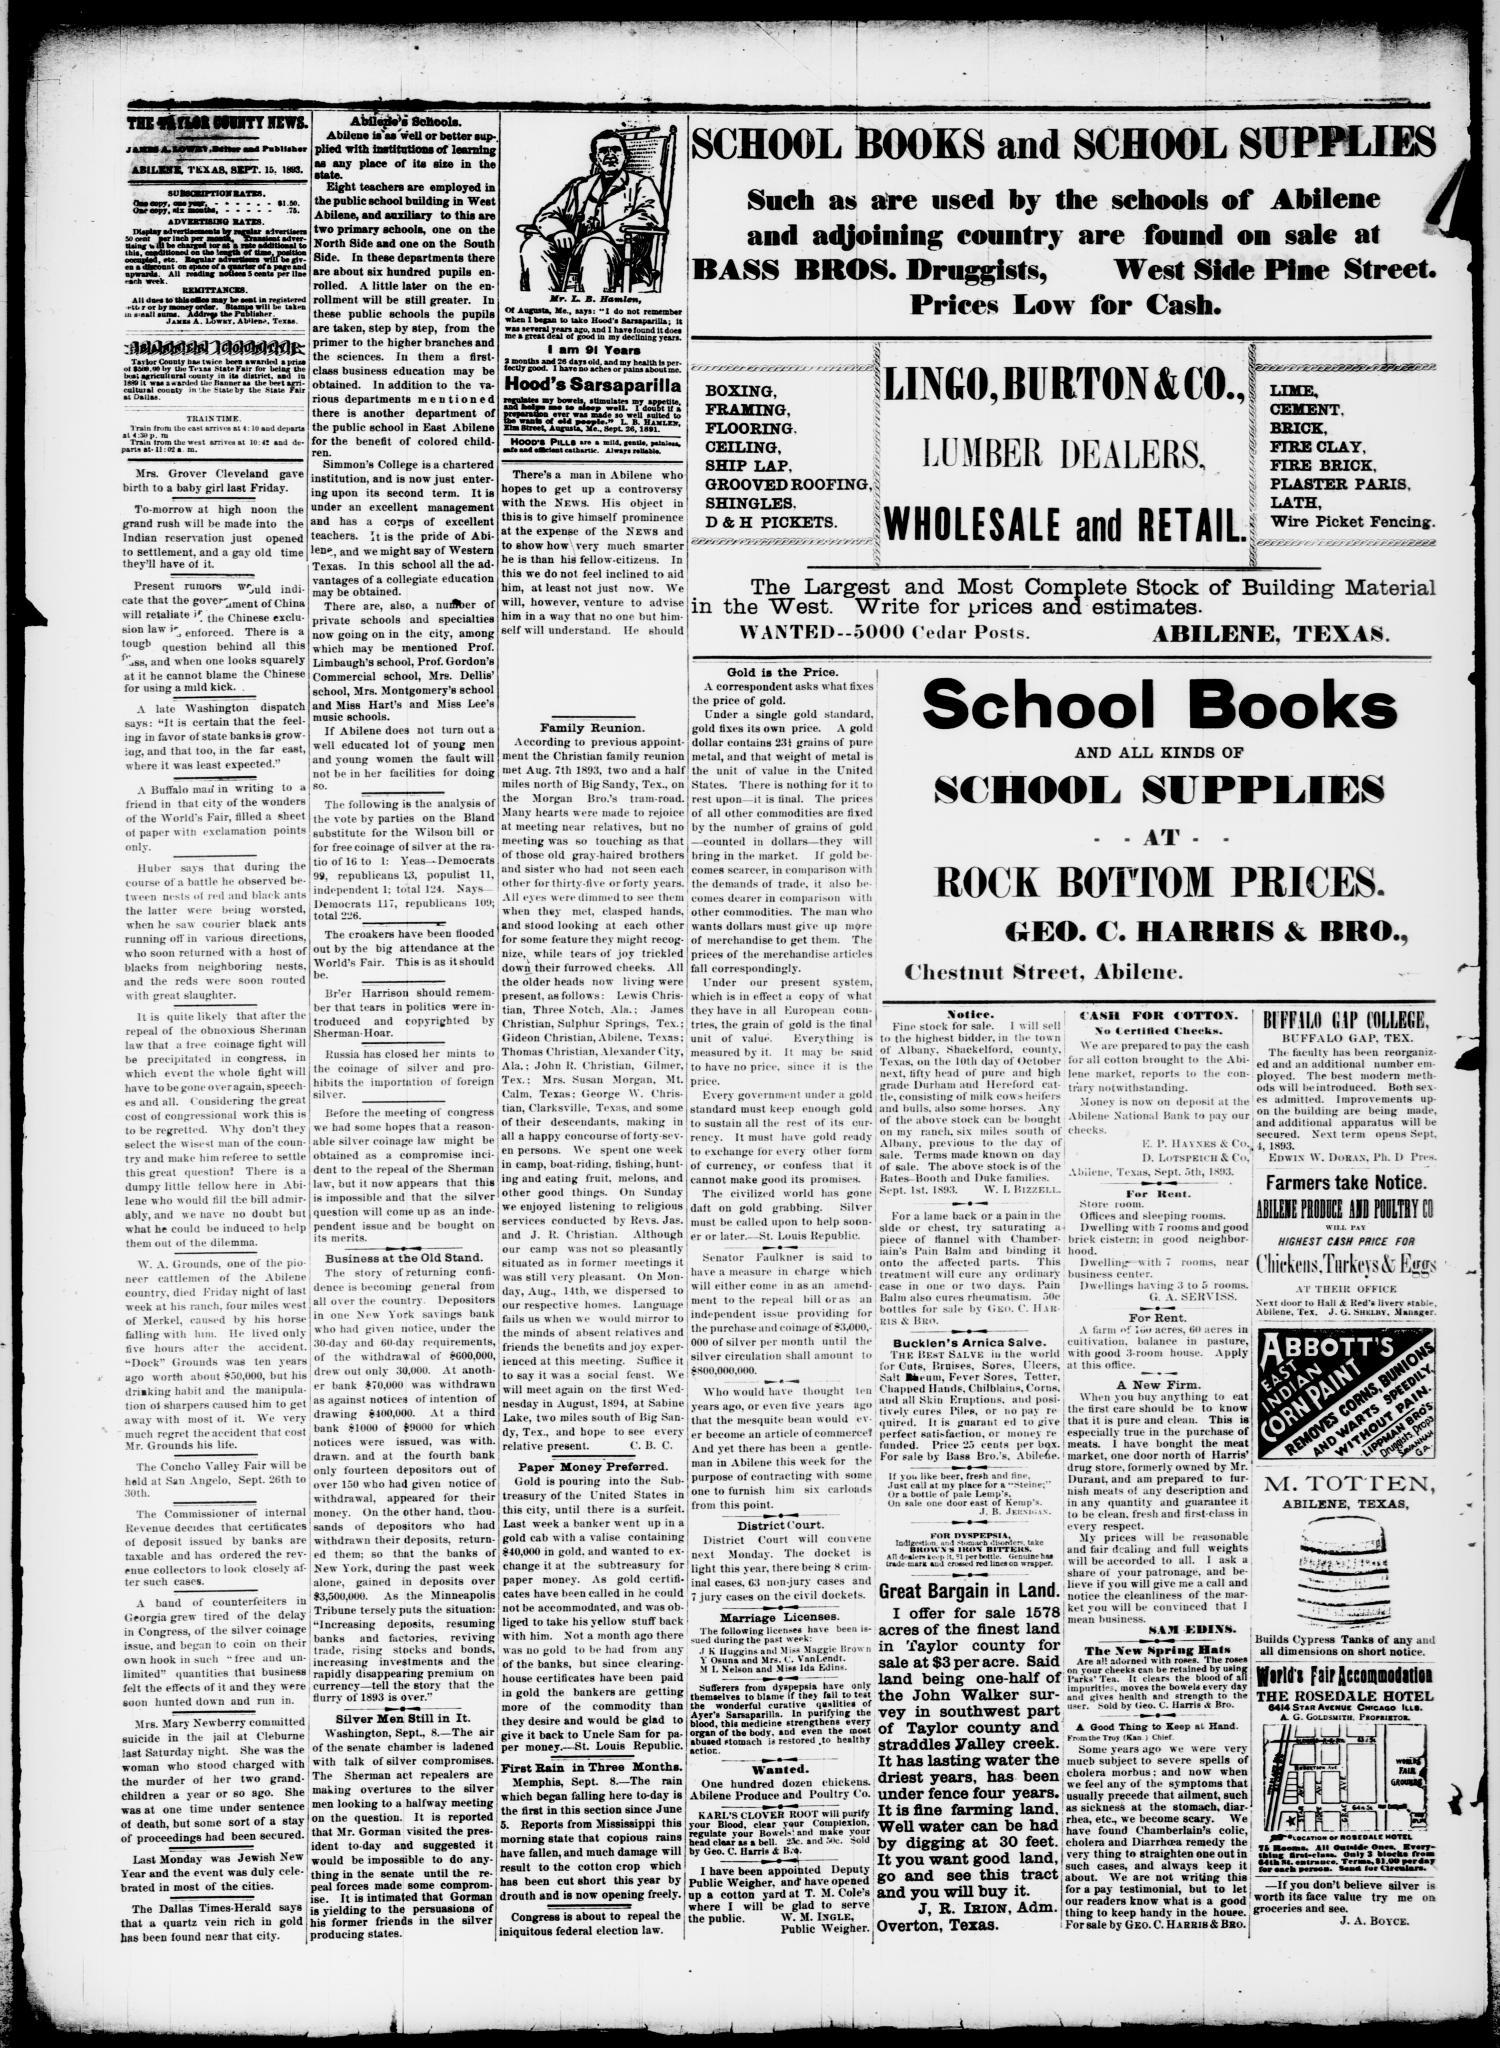 The Taylor County News  (Abilene, Tex ), Vol  9, No  30, Ed